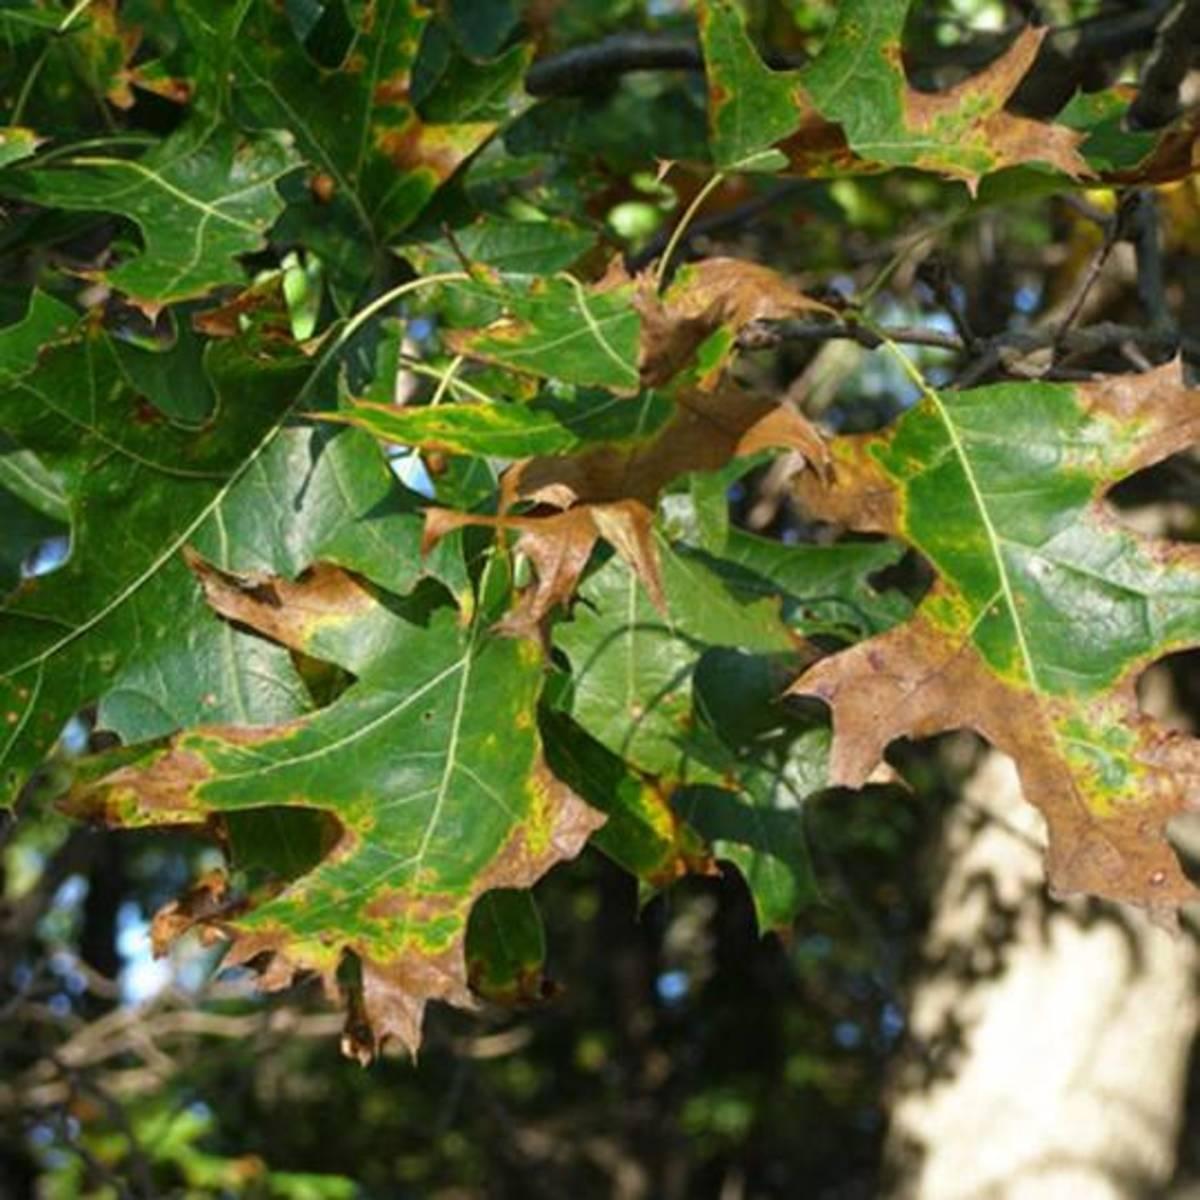 Beginning of oak wilt